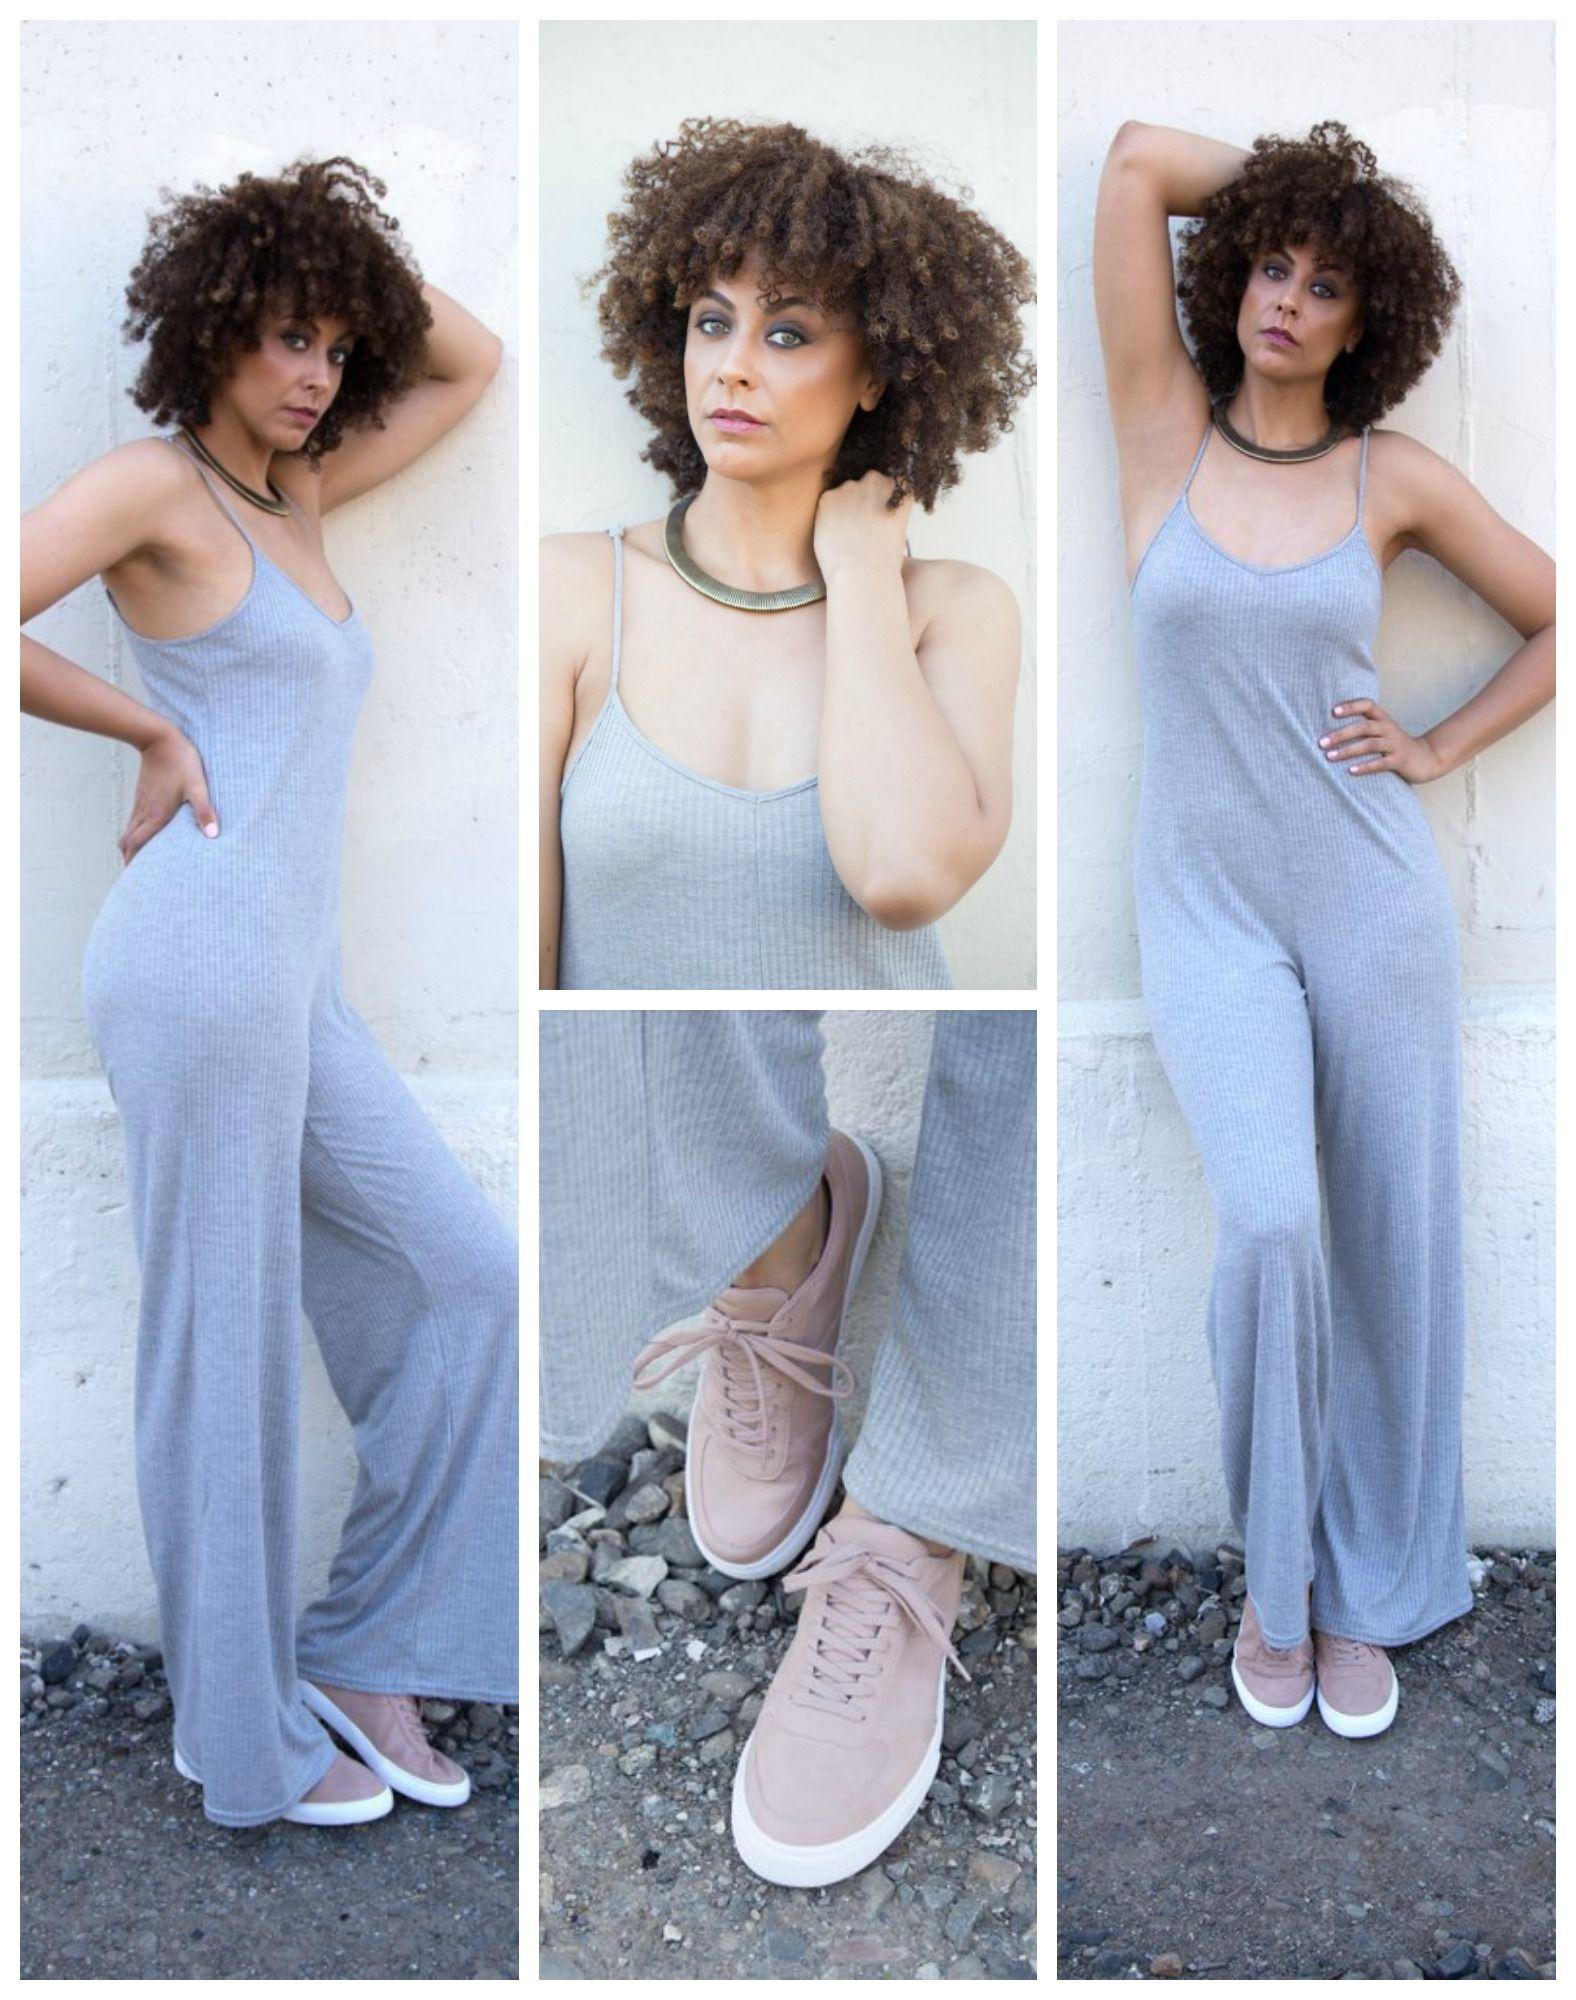 Tall Girls Fashion 35 Cute Outfits Ideas For Tall Ladies Tall Girl Fashion Tall Girl Tall Women [ 2000 x 1576 Pixel ]